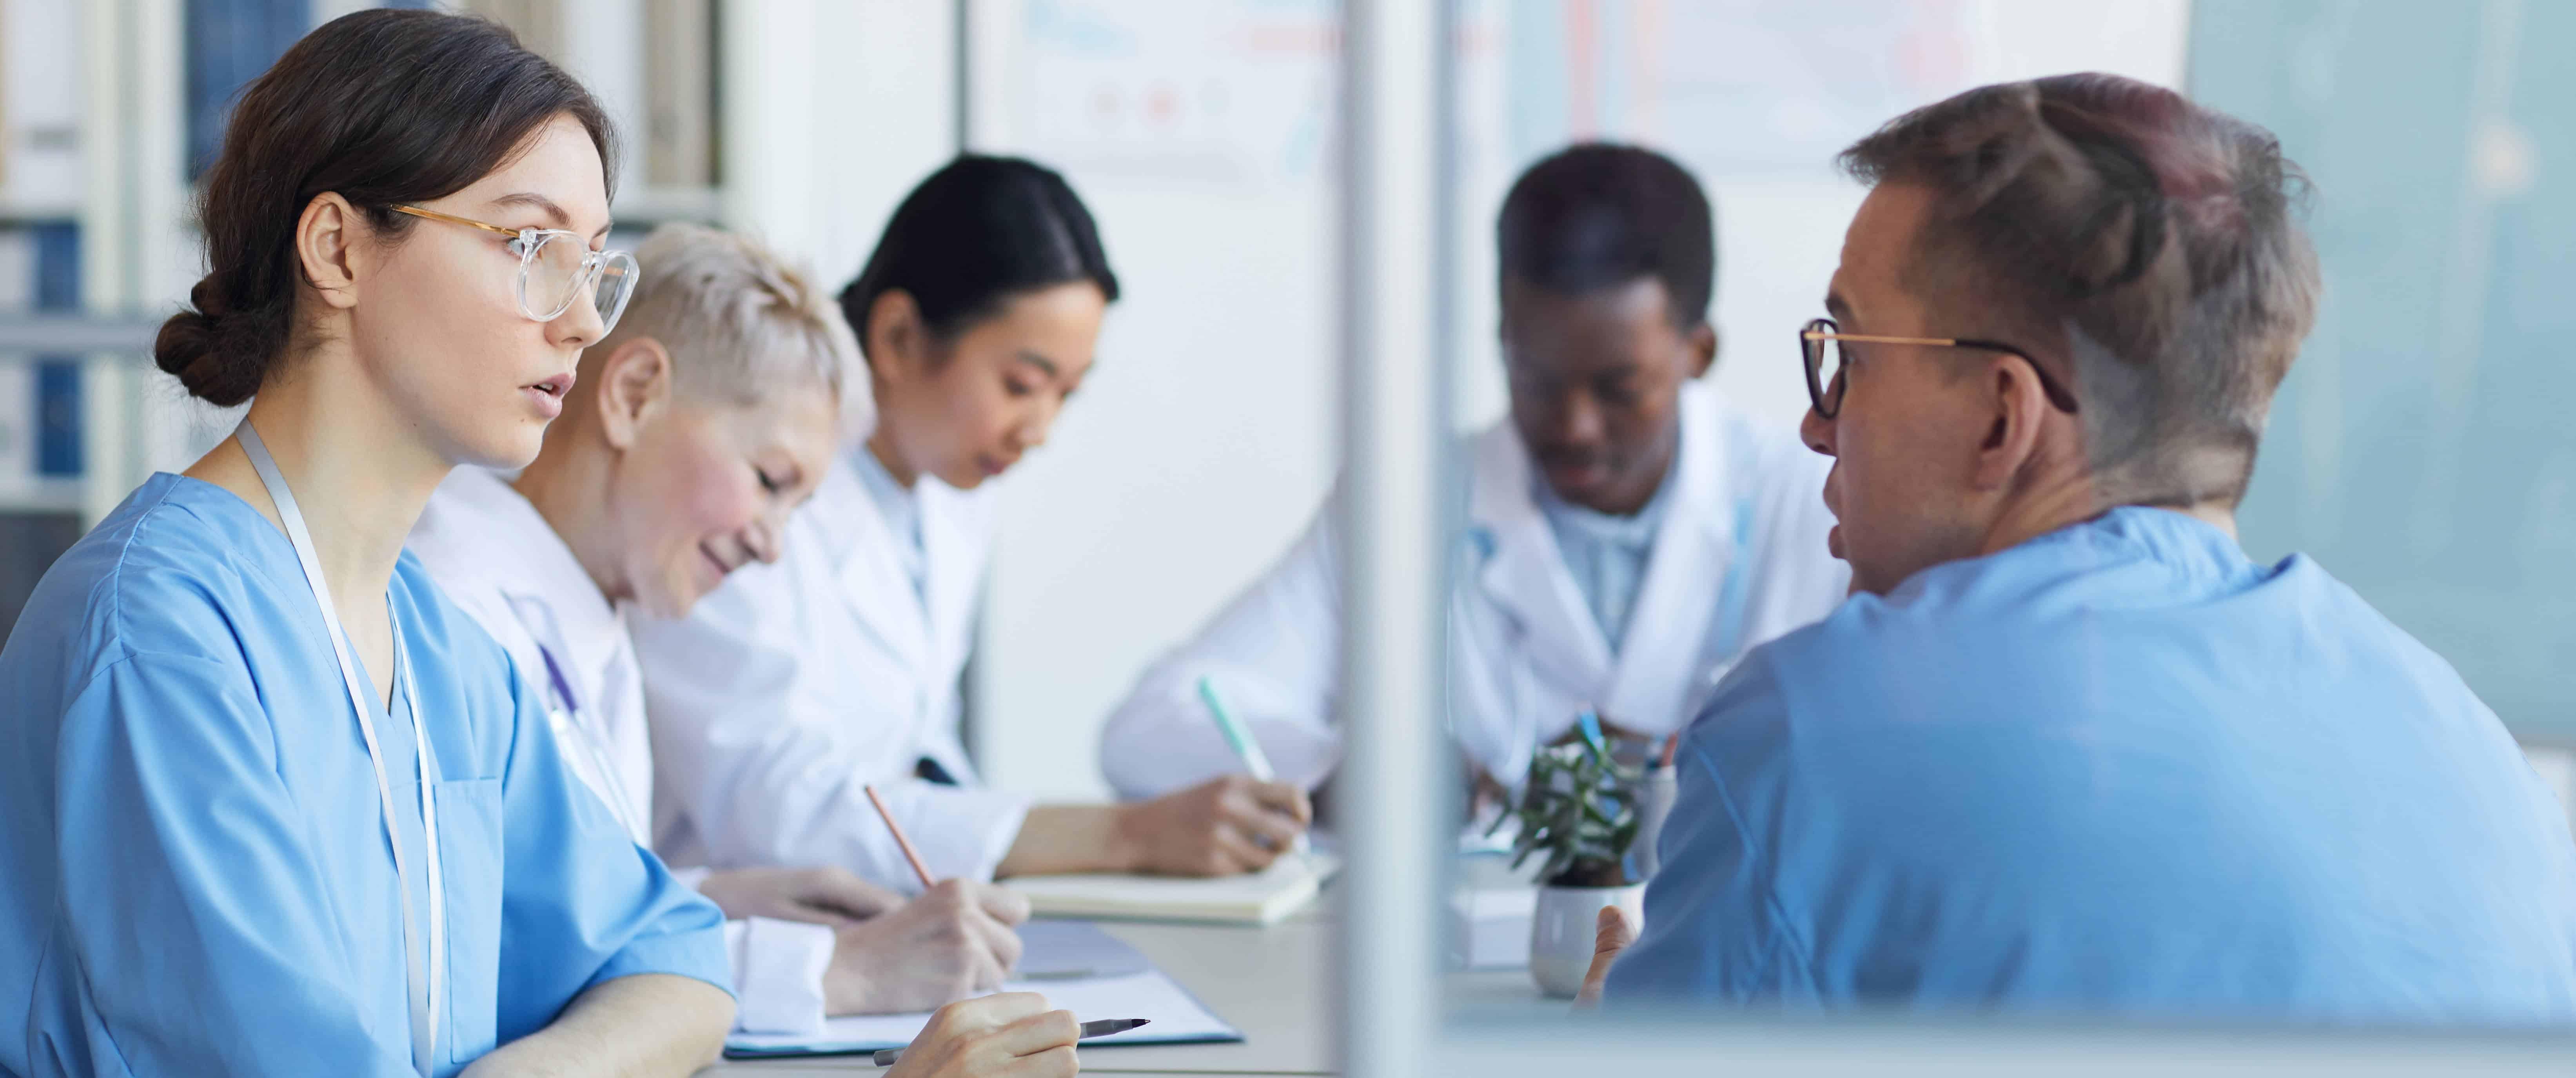 UCAT, BMAT & Medical Schools Seminar | Prep Zone Academy